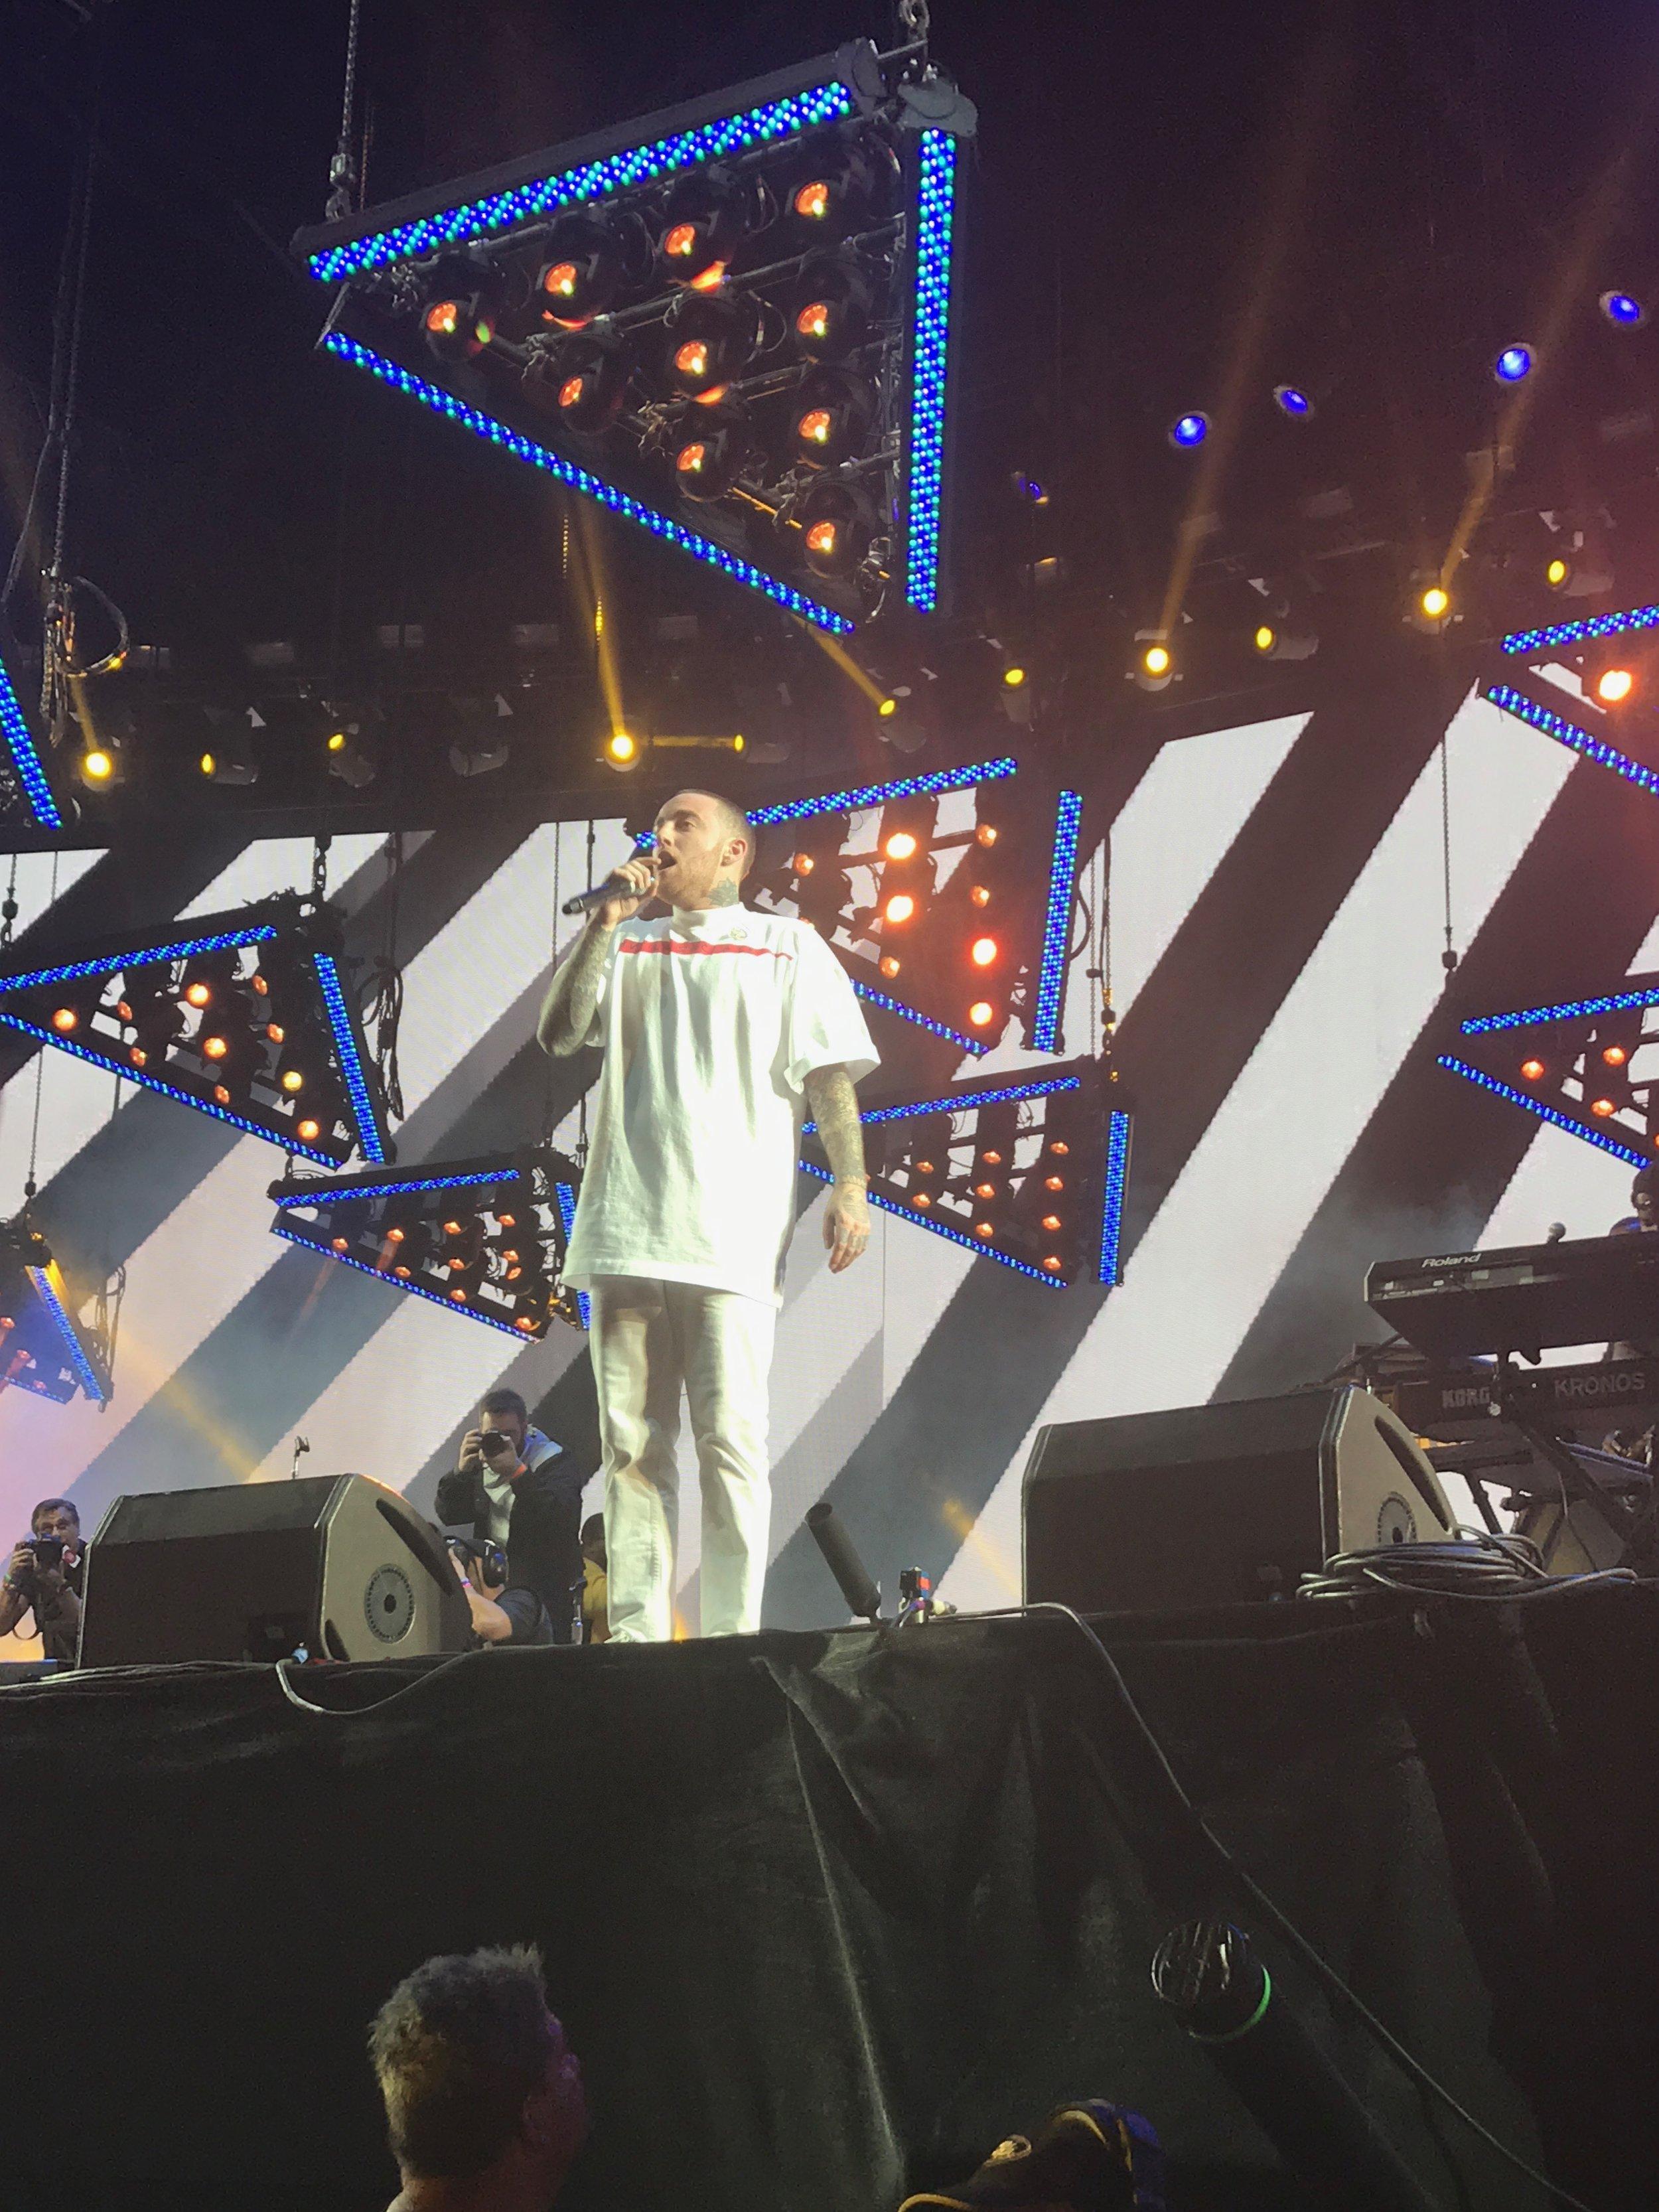 Mac Miller performing at the Sahara Tent